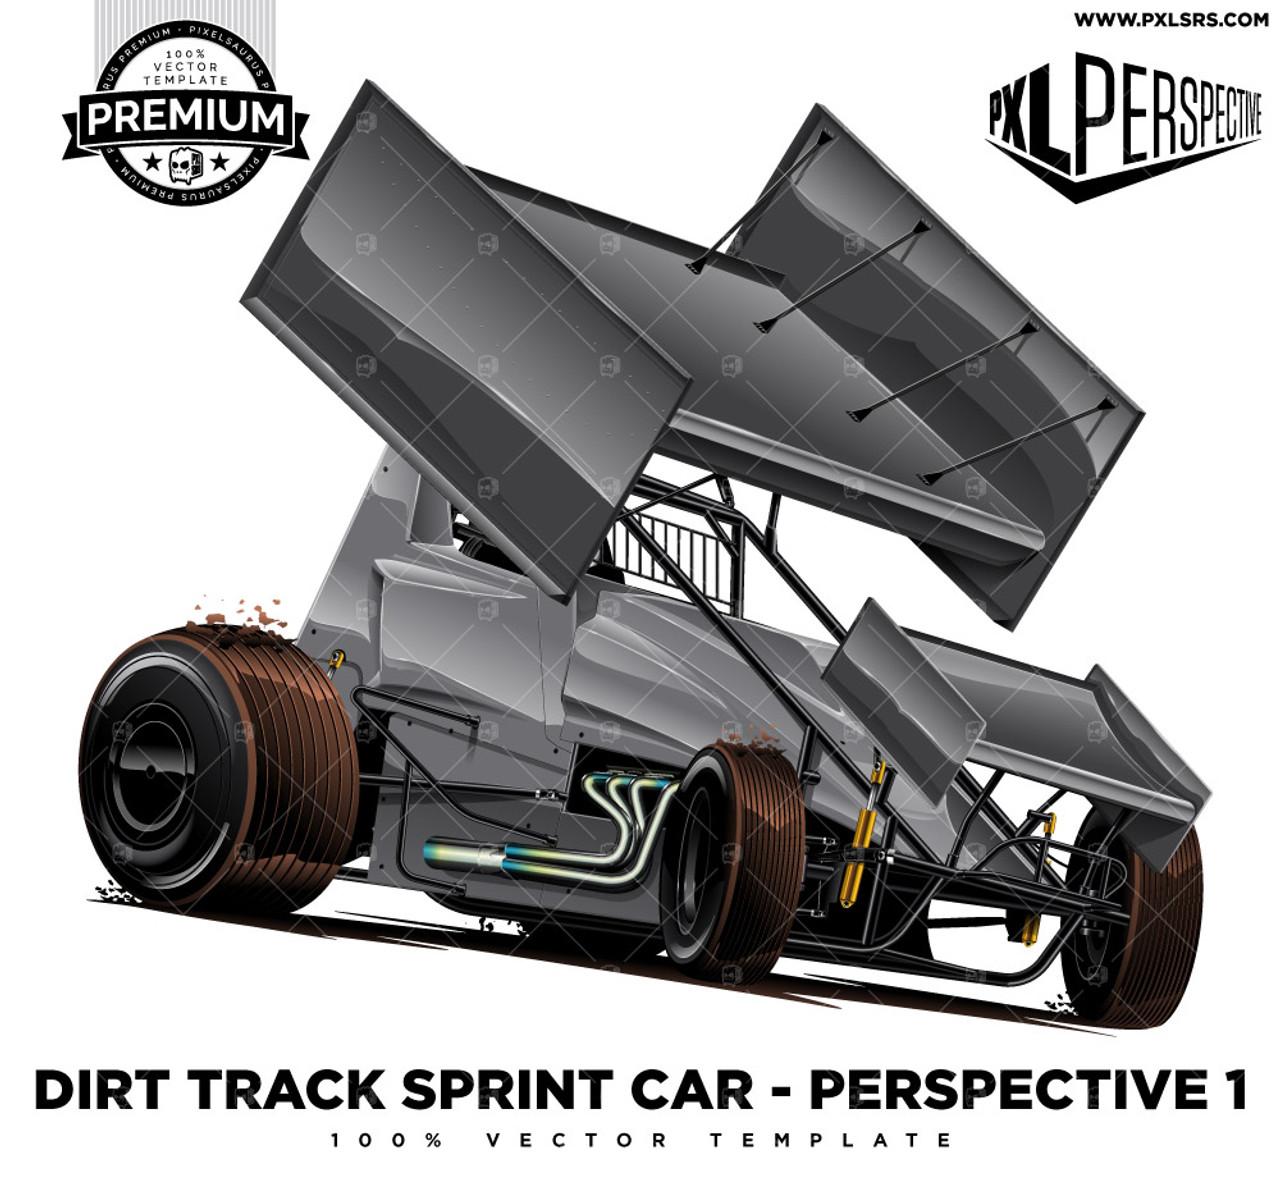 Dirt Track Sprint Car Premium Perspective 100 Vector Template